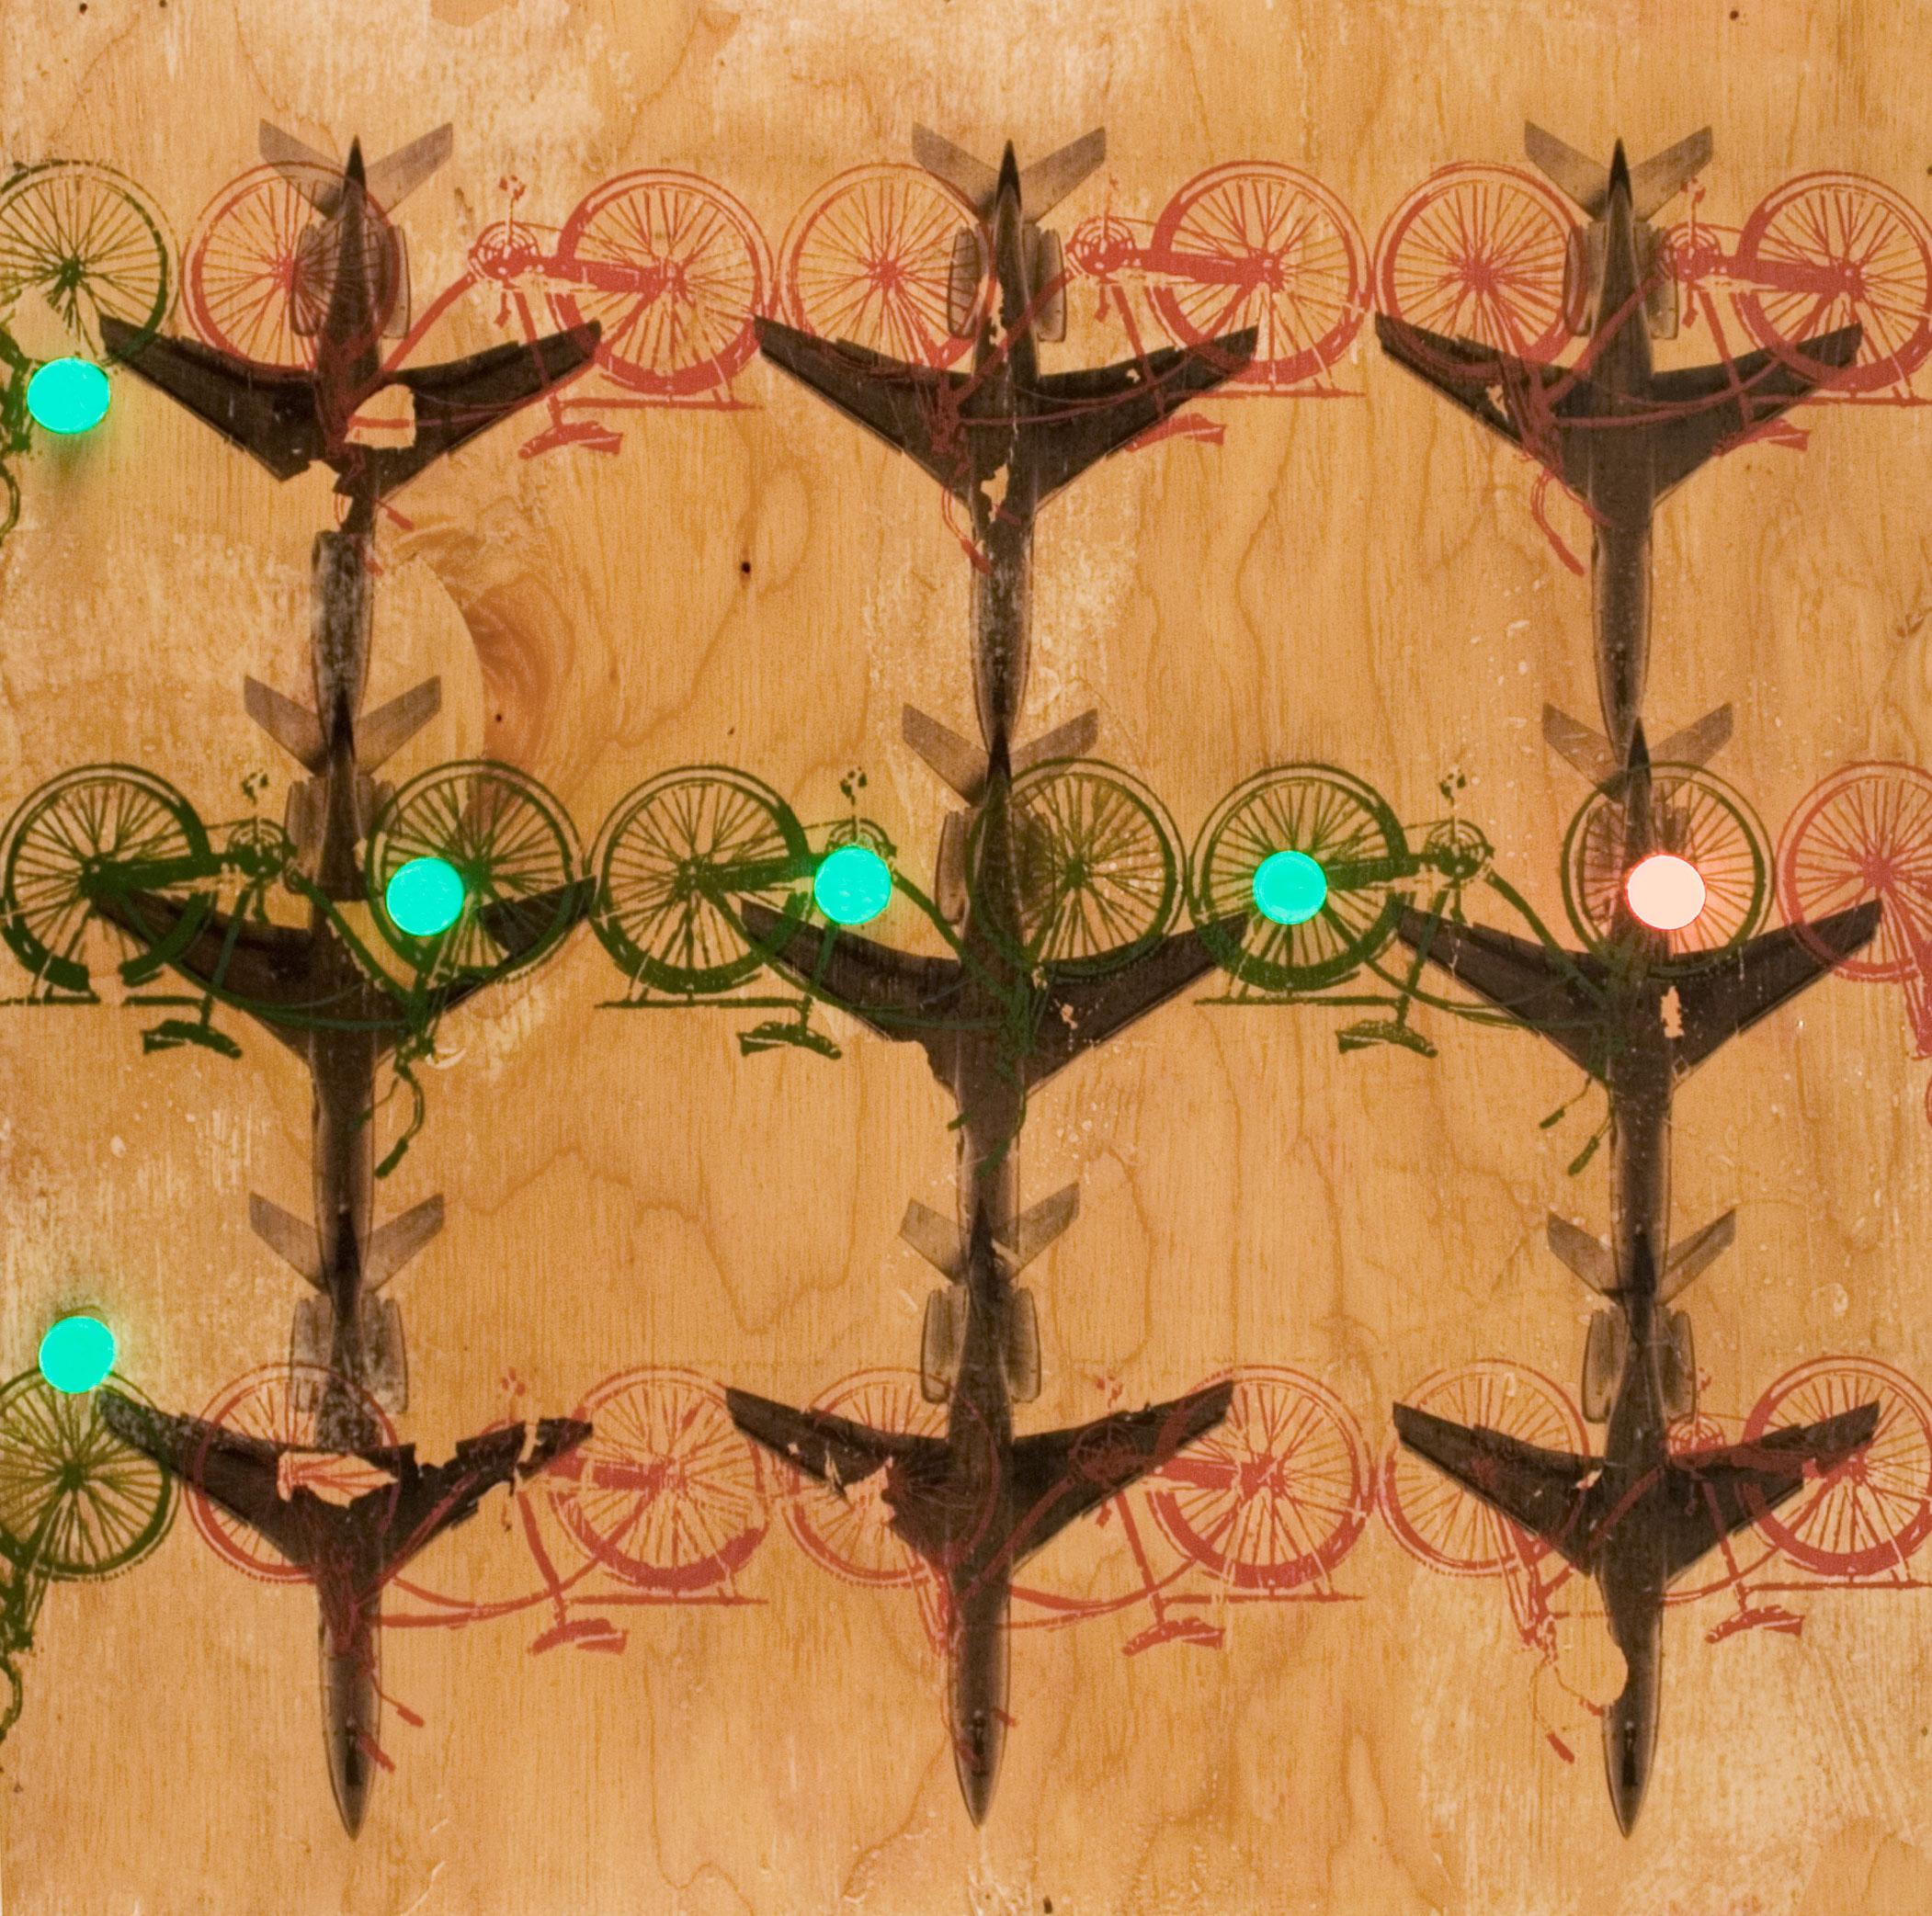 Lightspeed-3-(2009).jpg